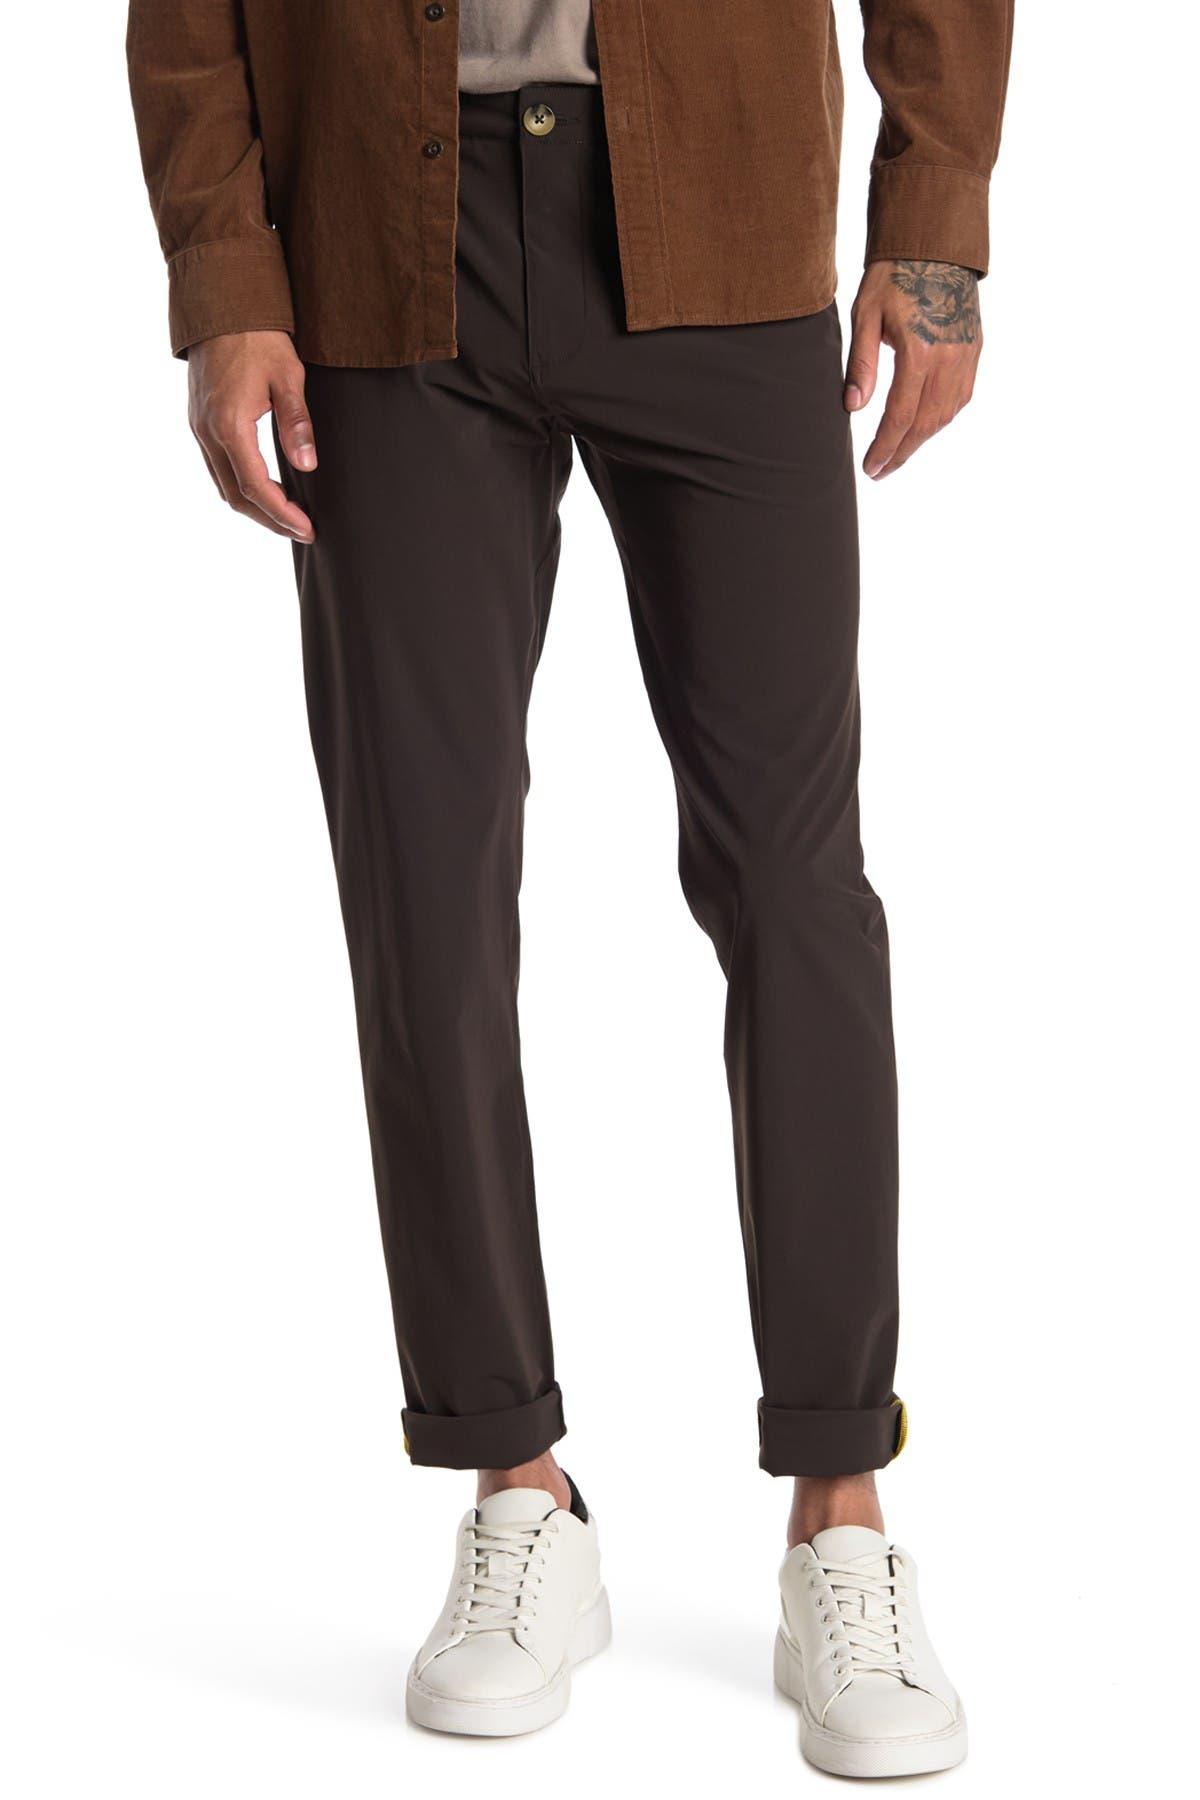 Image of RHONE Eco Legend Chino Pants